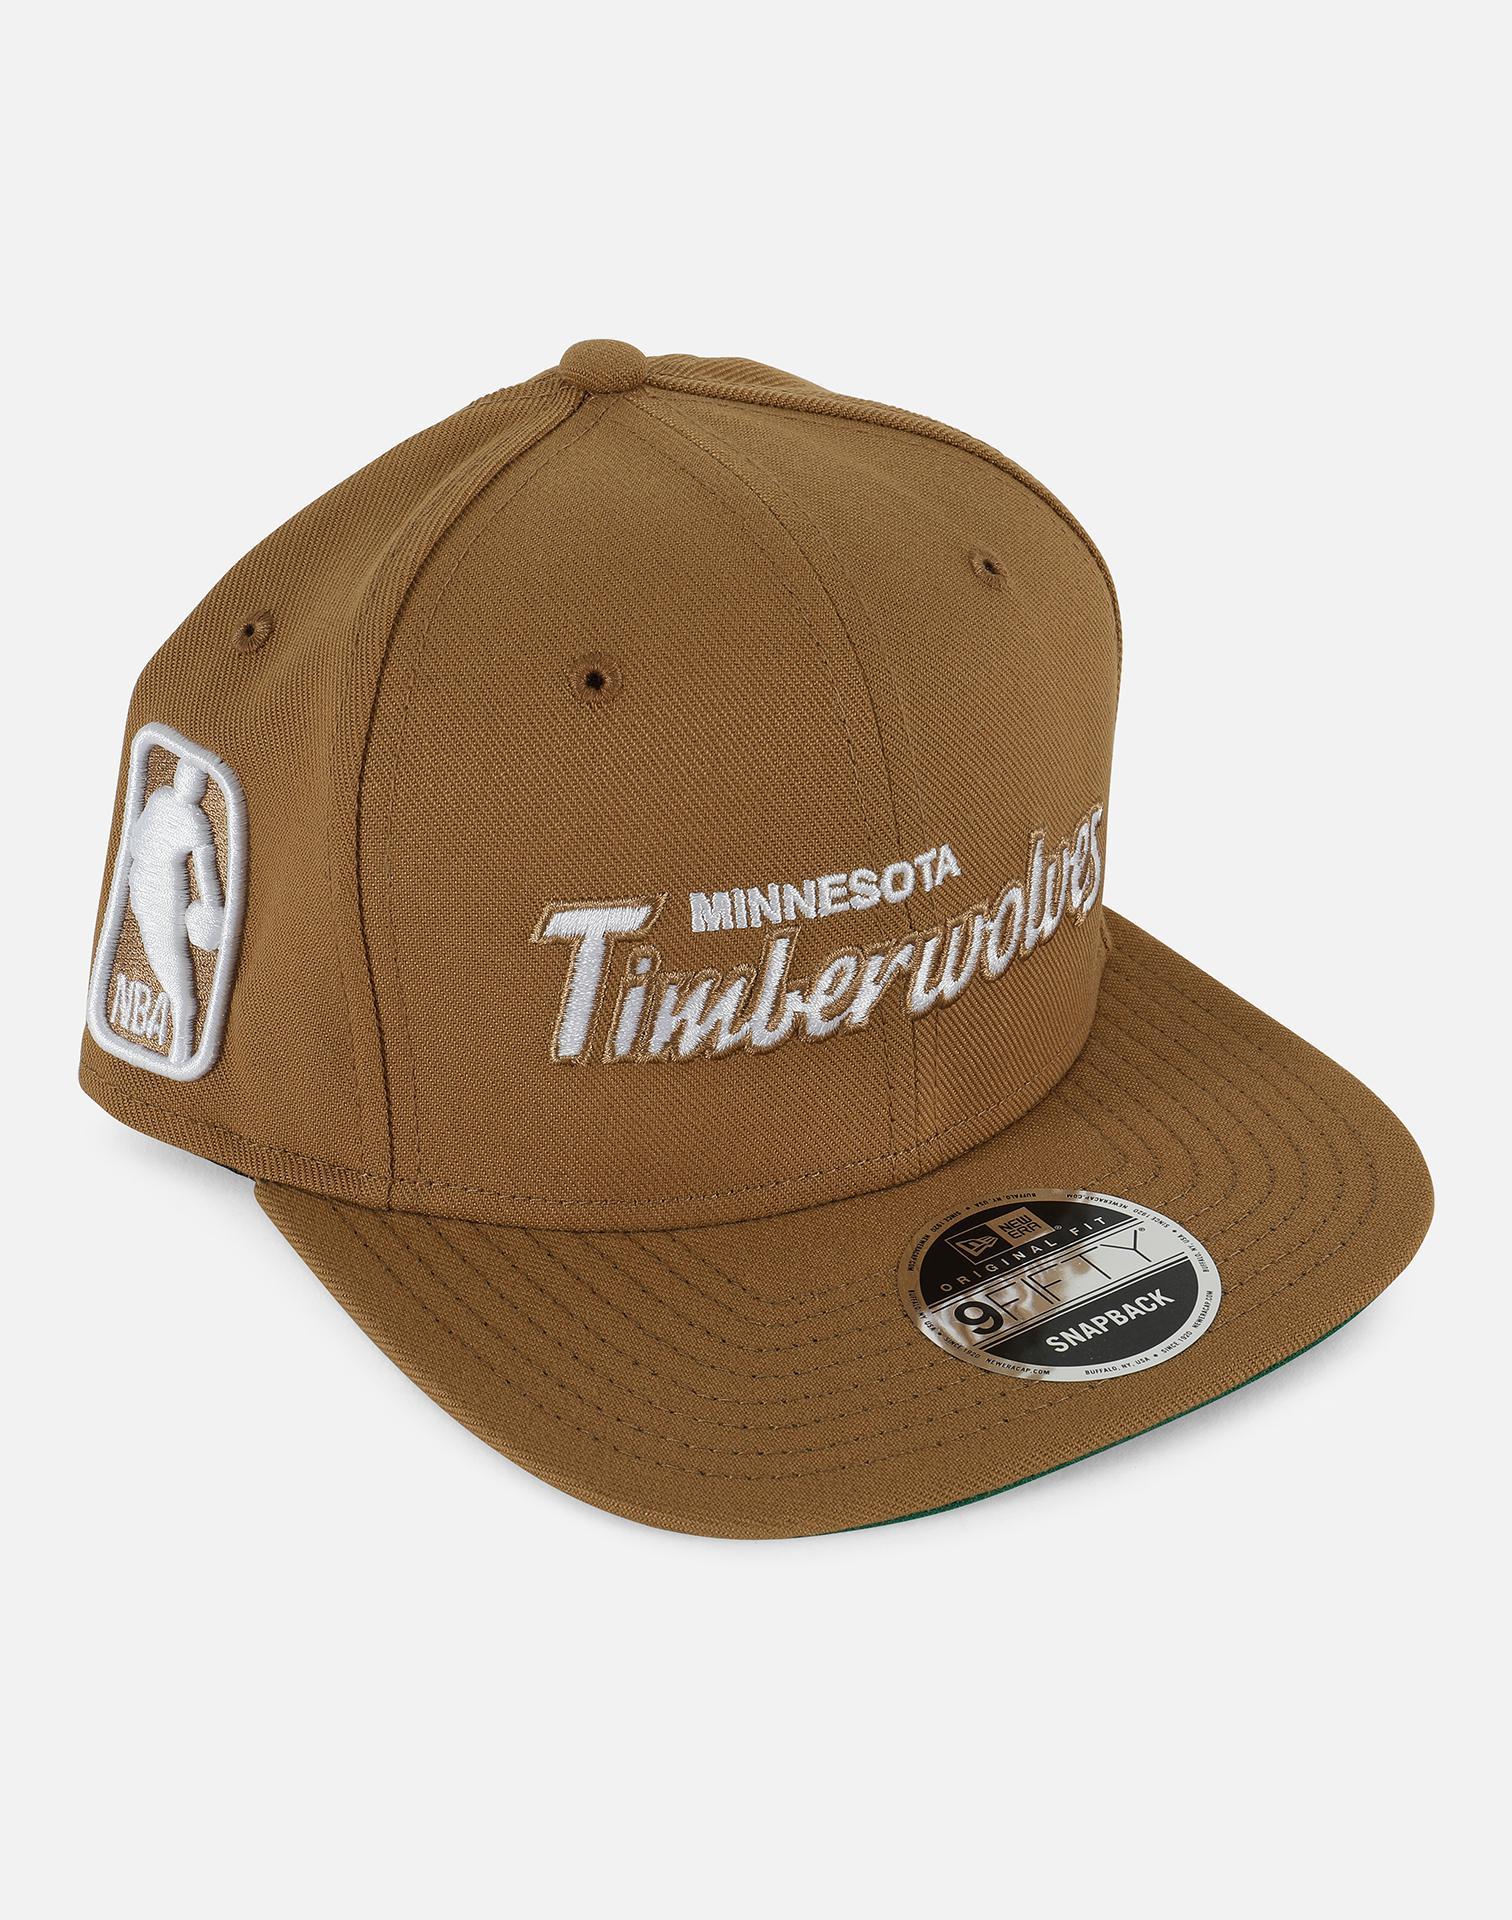 newest db2ae ffada ... new era nba fall dubs 9fifty snapback cap 5d60e 337b6  reduced ktz brown  950 nba minnesota timberwolves snapback hat for men lyst. view fullscreen  6bff3